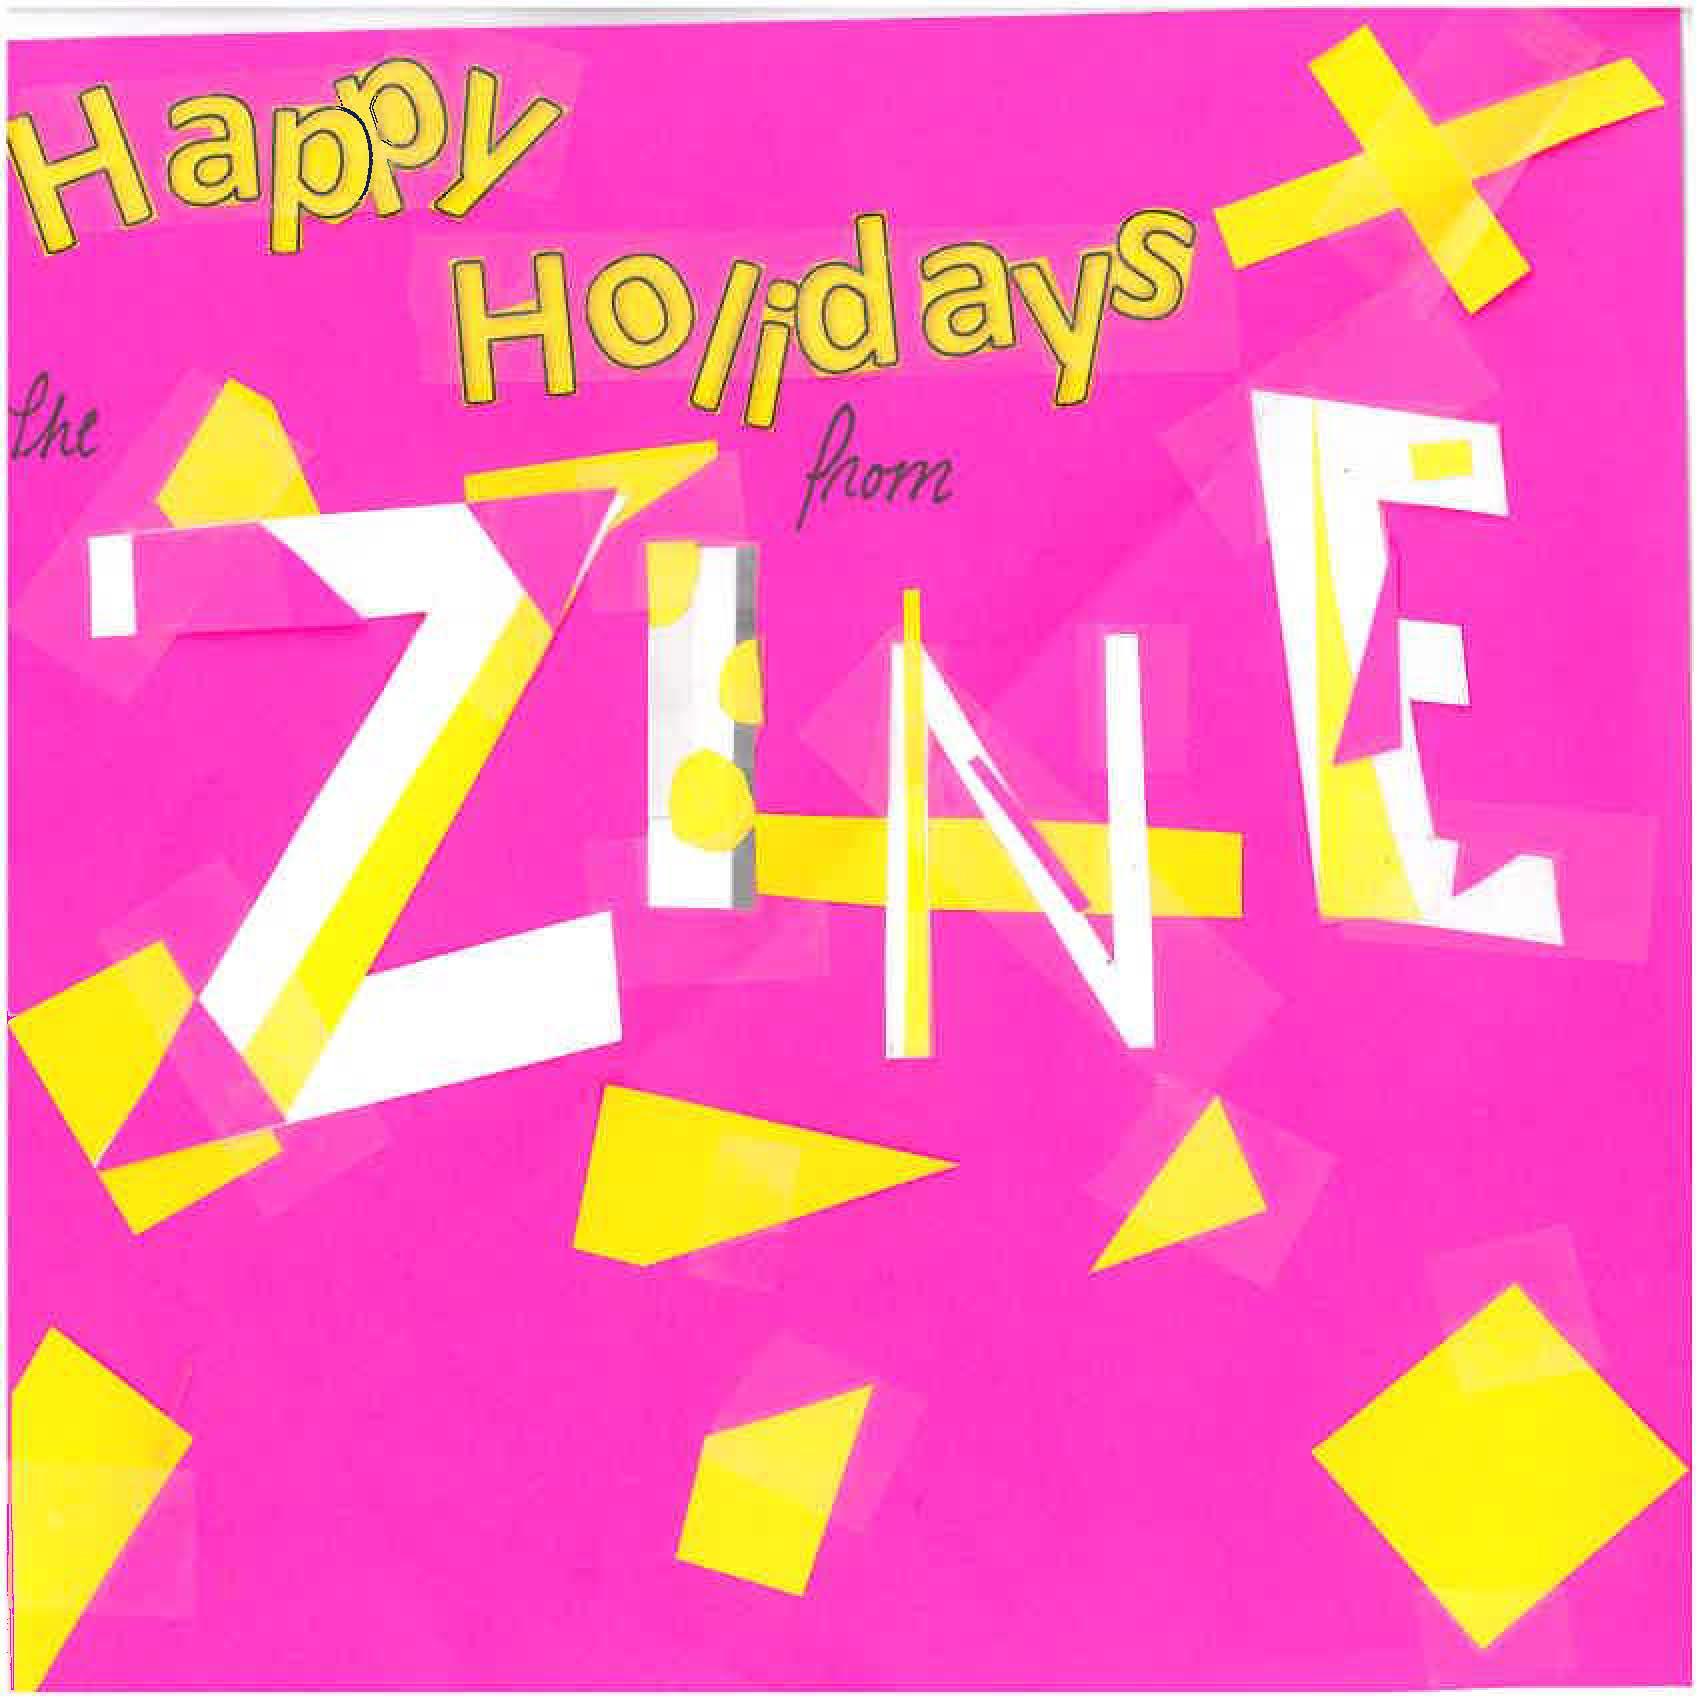 Coalition Zine